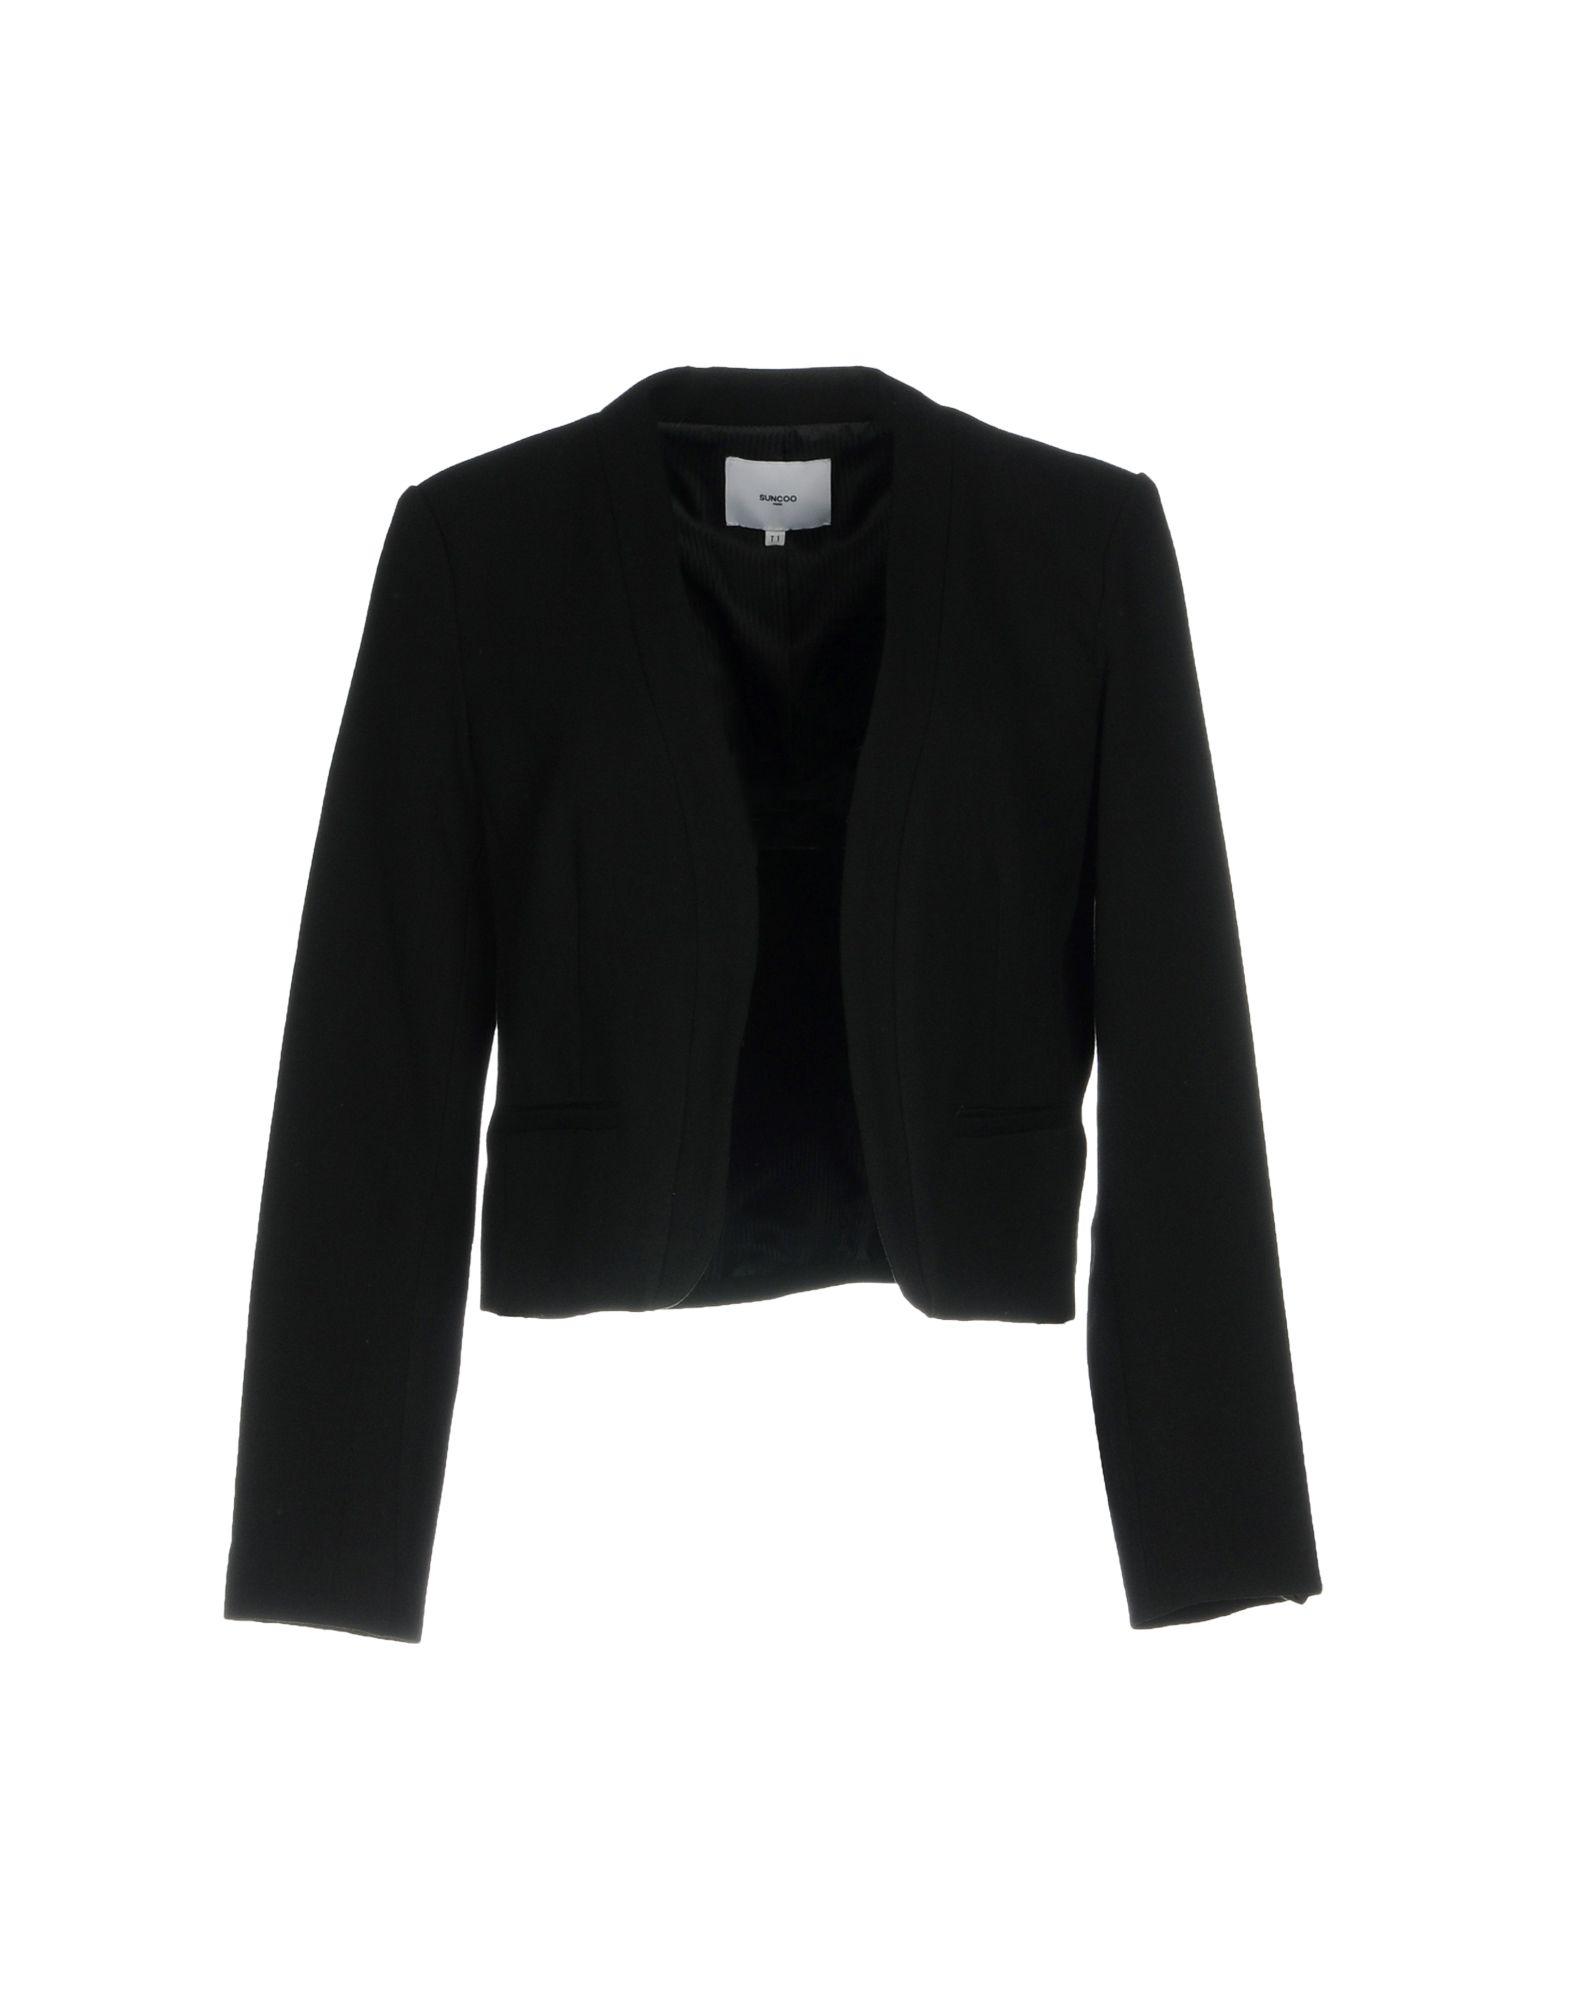 SUNCOO Blazer in Black